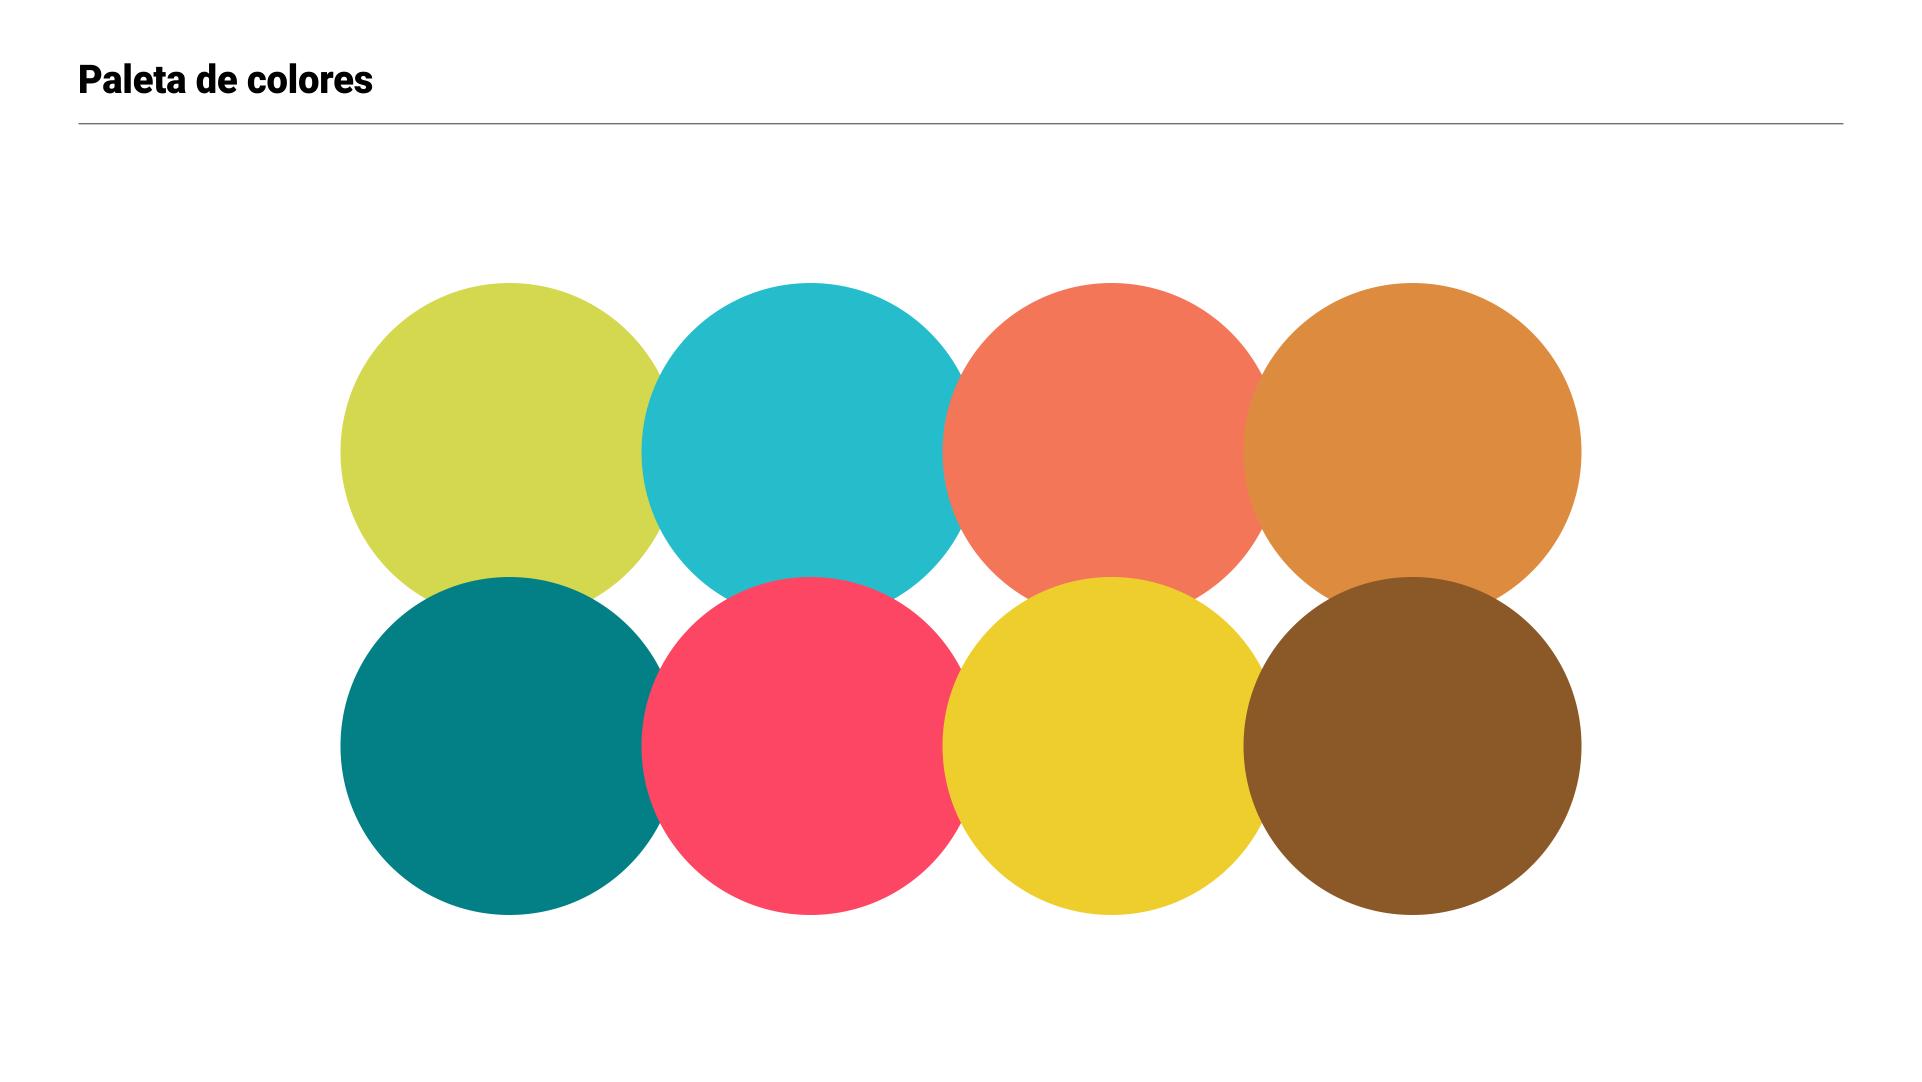 Branding Bucaré - paleta de colores